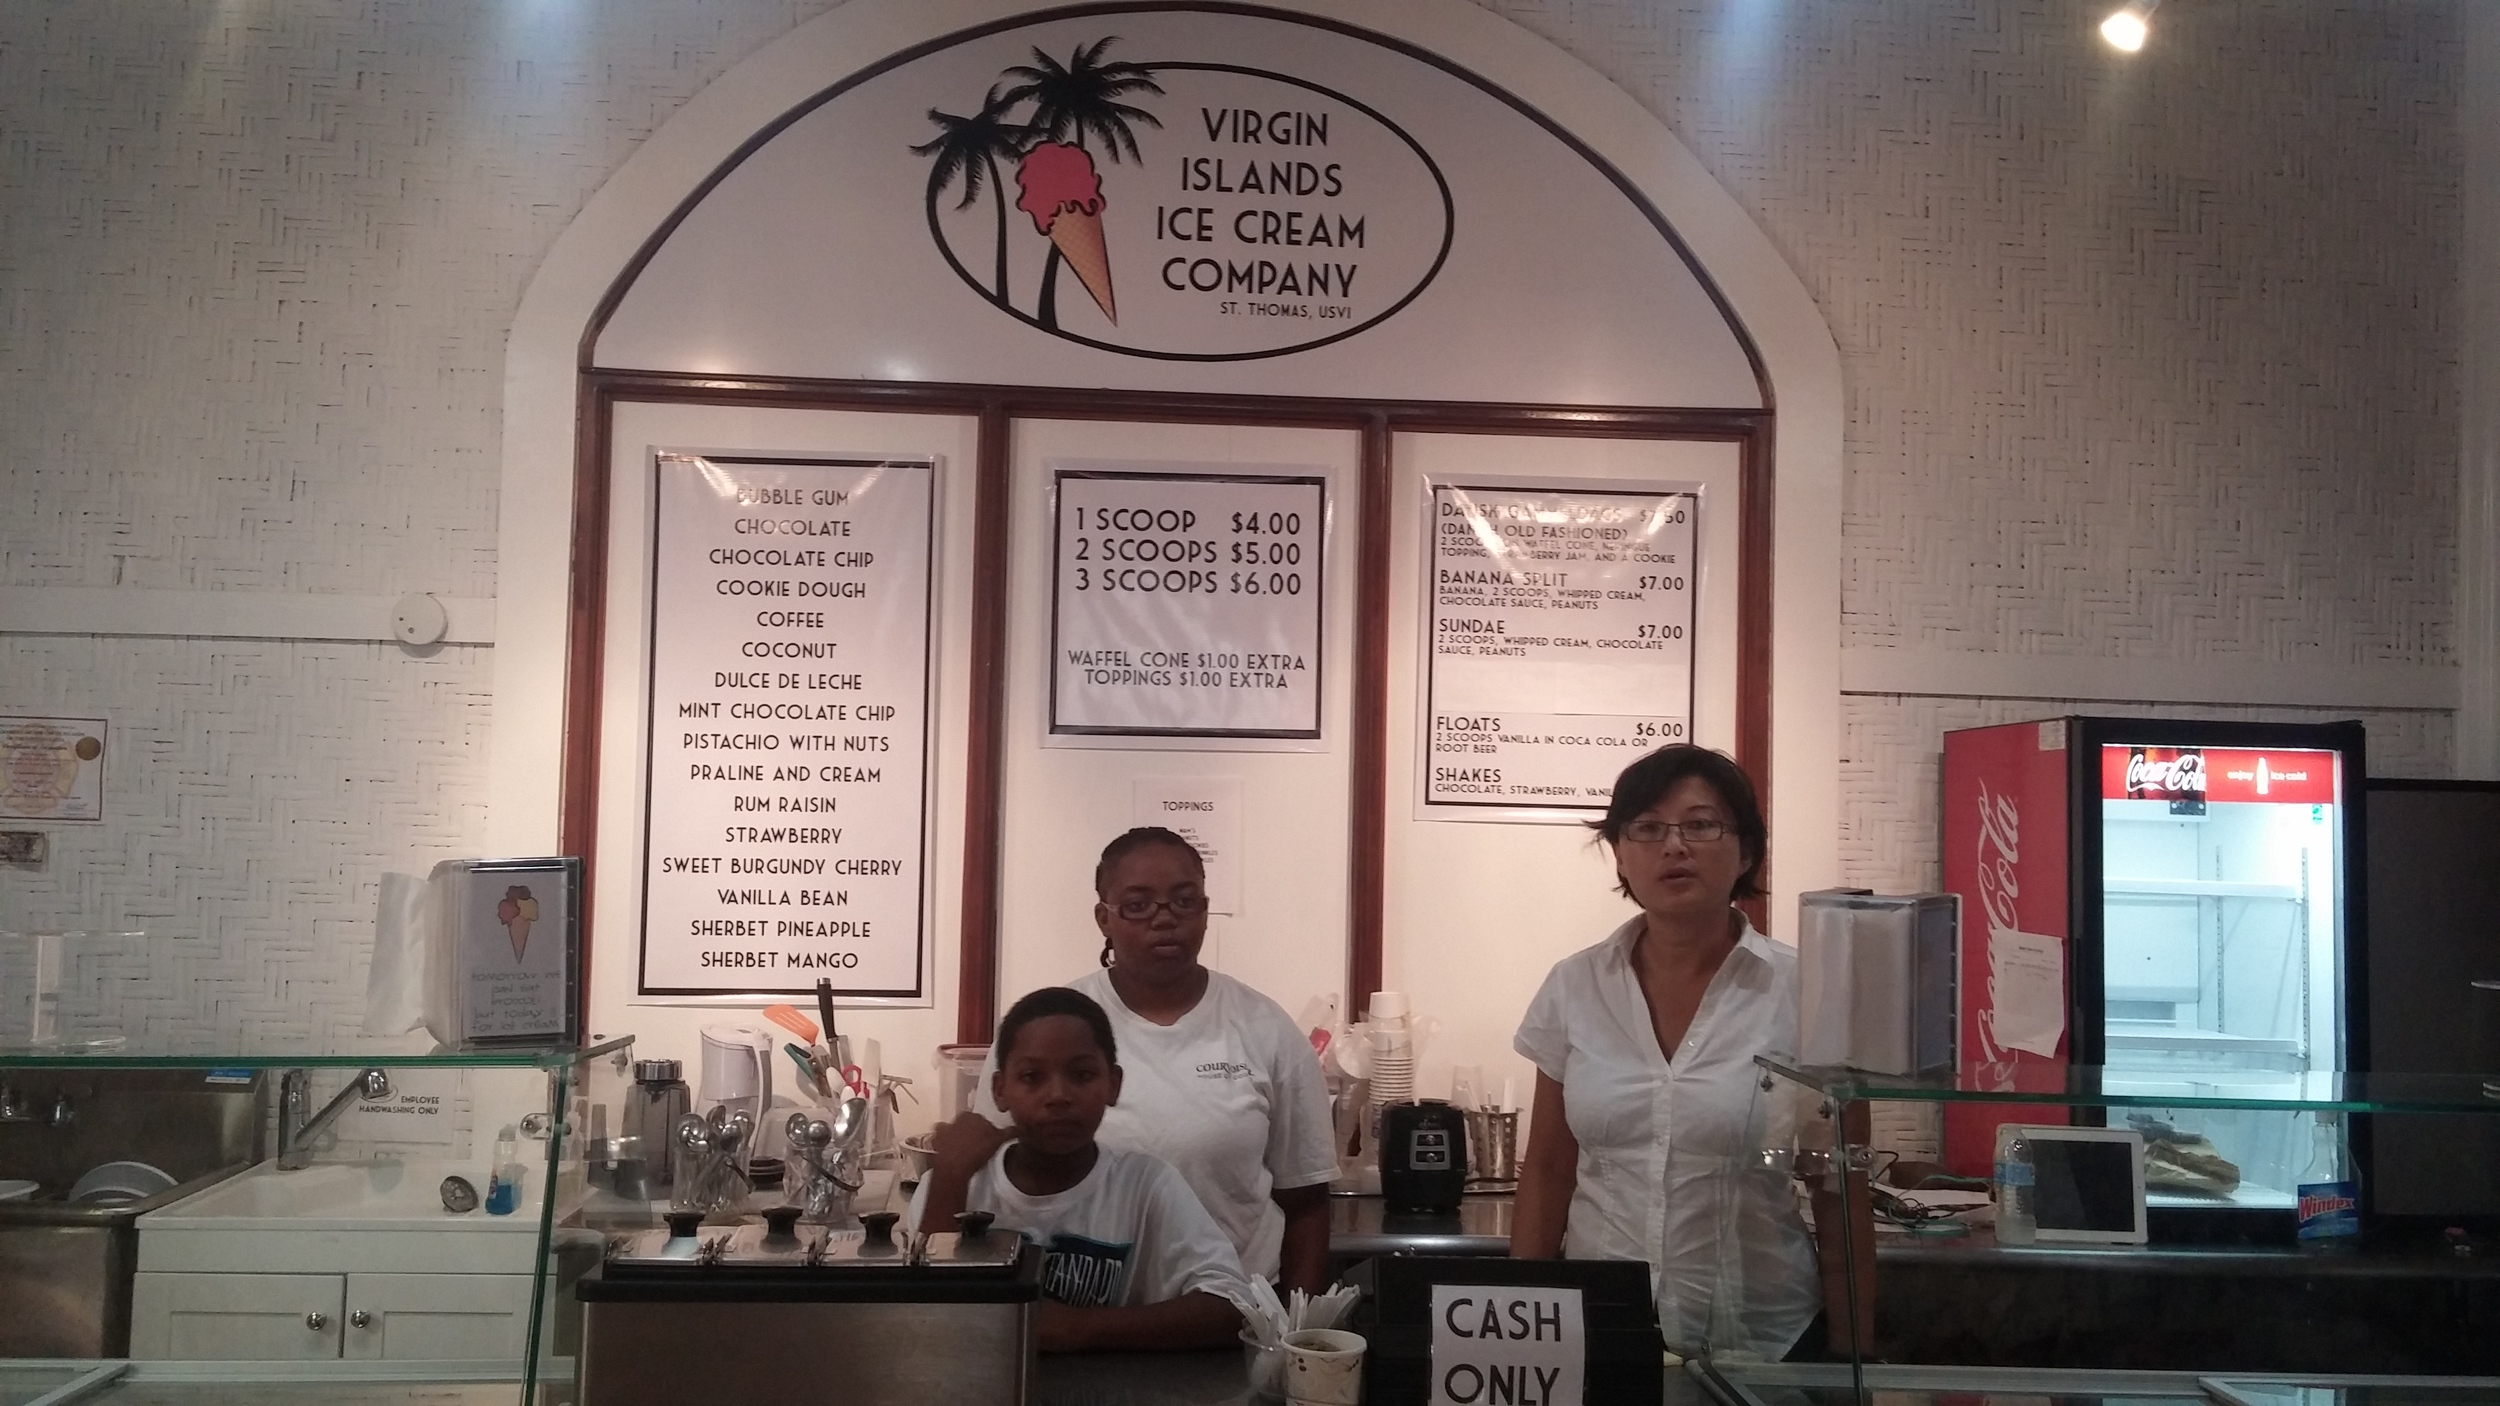 ice cream store in Vendors Plaza on St. Thomas